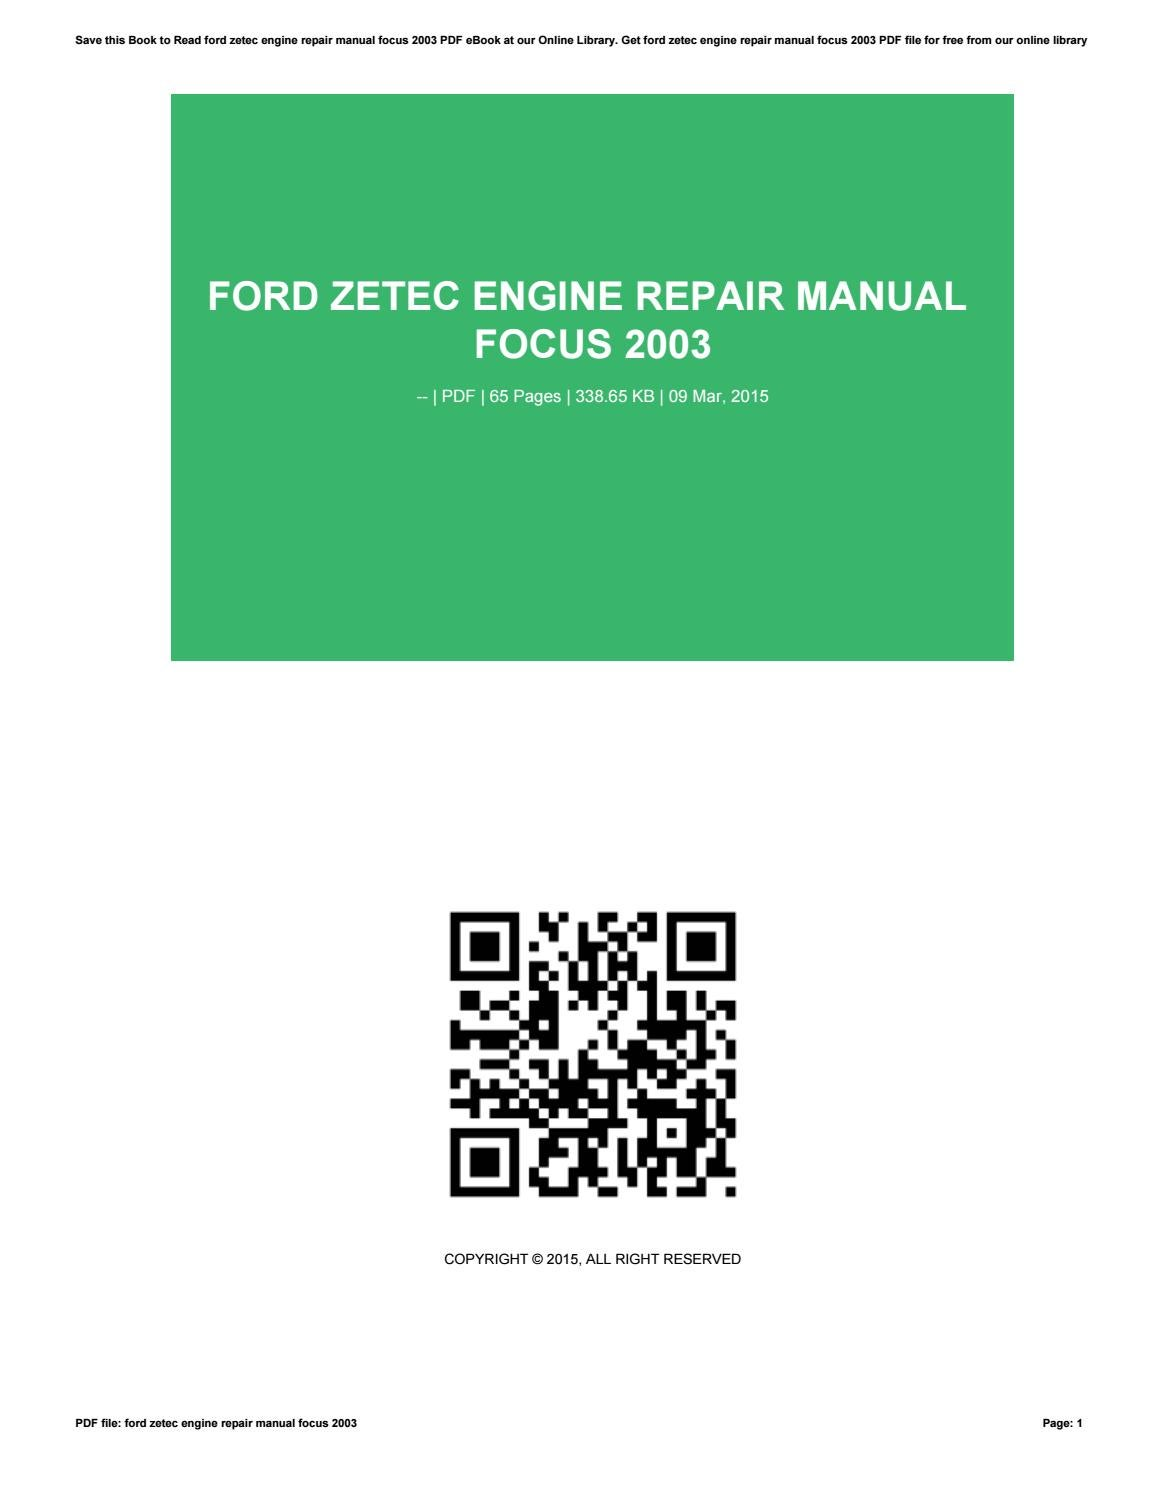 ford focus manual zetec ebook